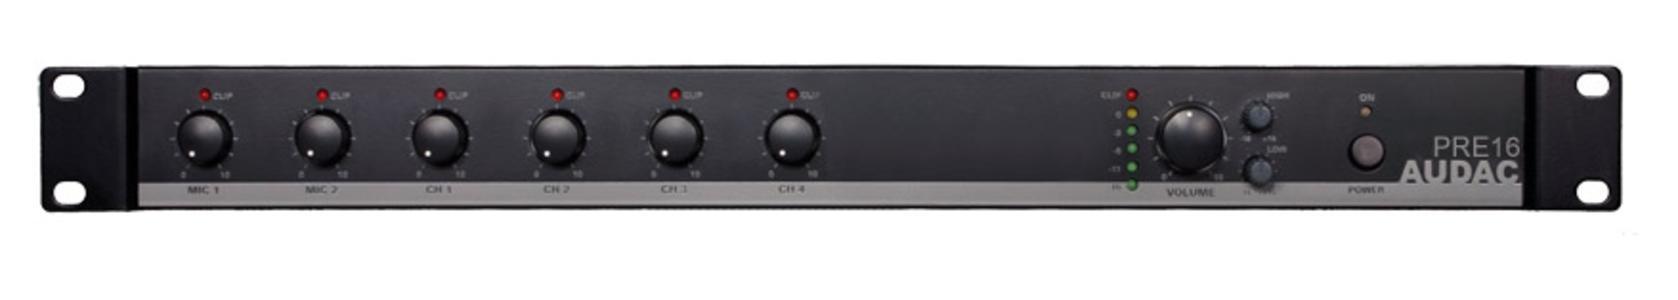 Audac PRE16 - mixer rack 6 ingressi